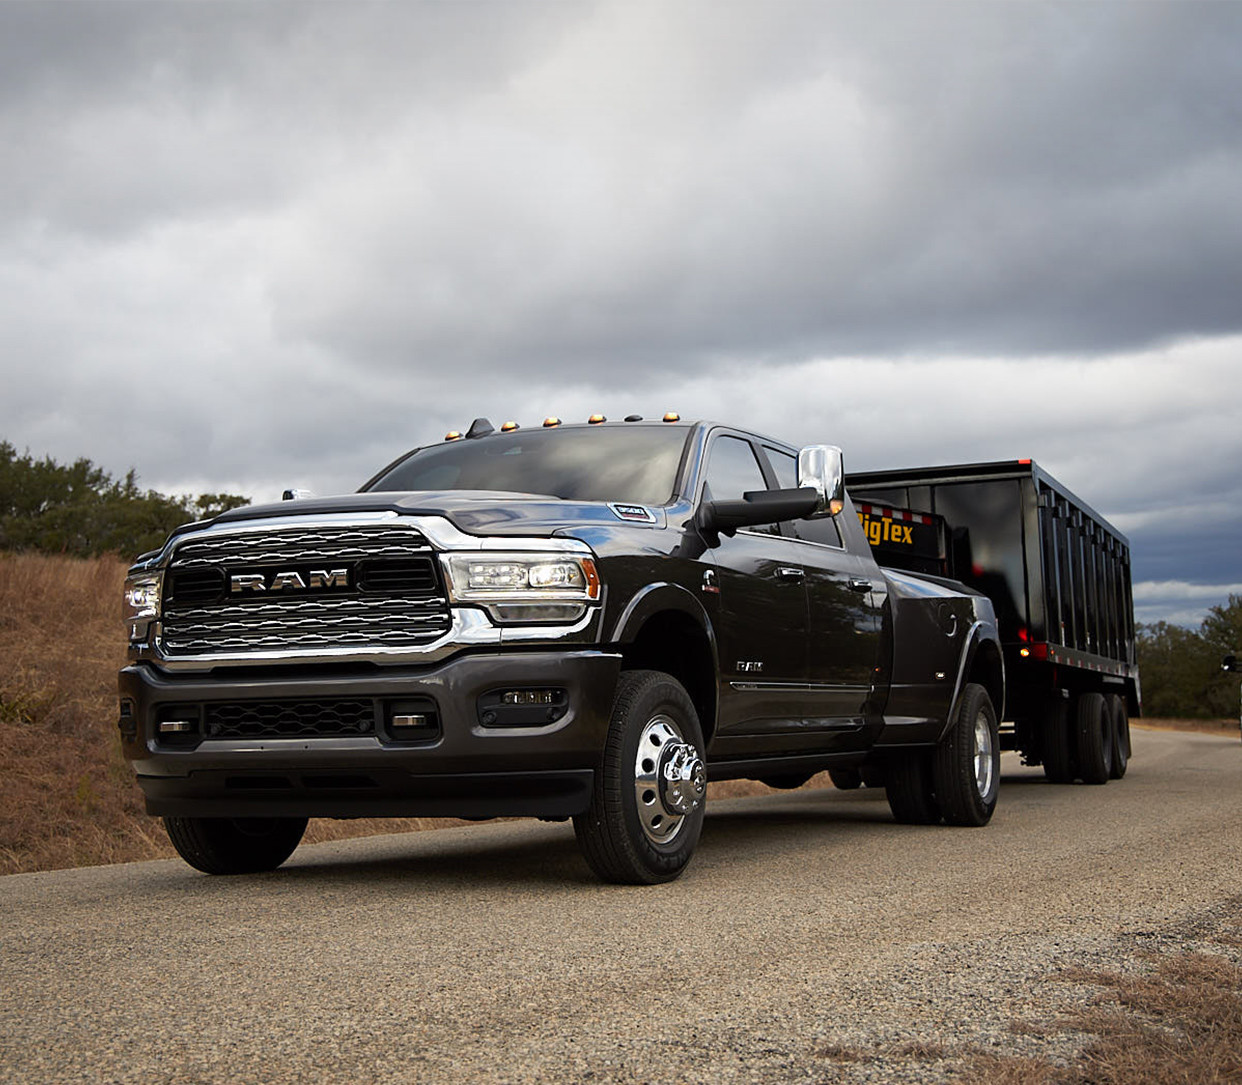 New 2019 Ram 3500 - Diesel Truck | Ram Truck Canada